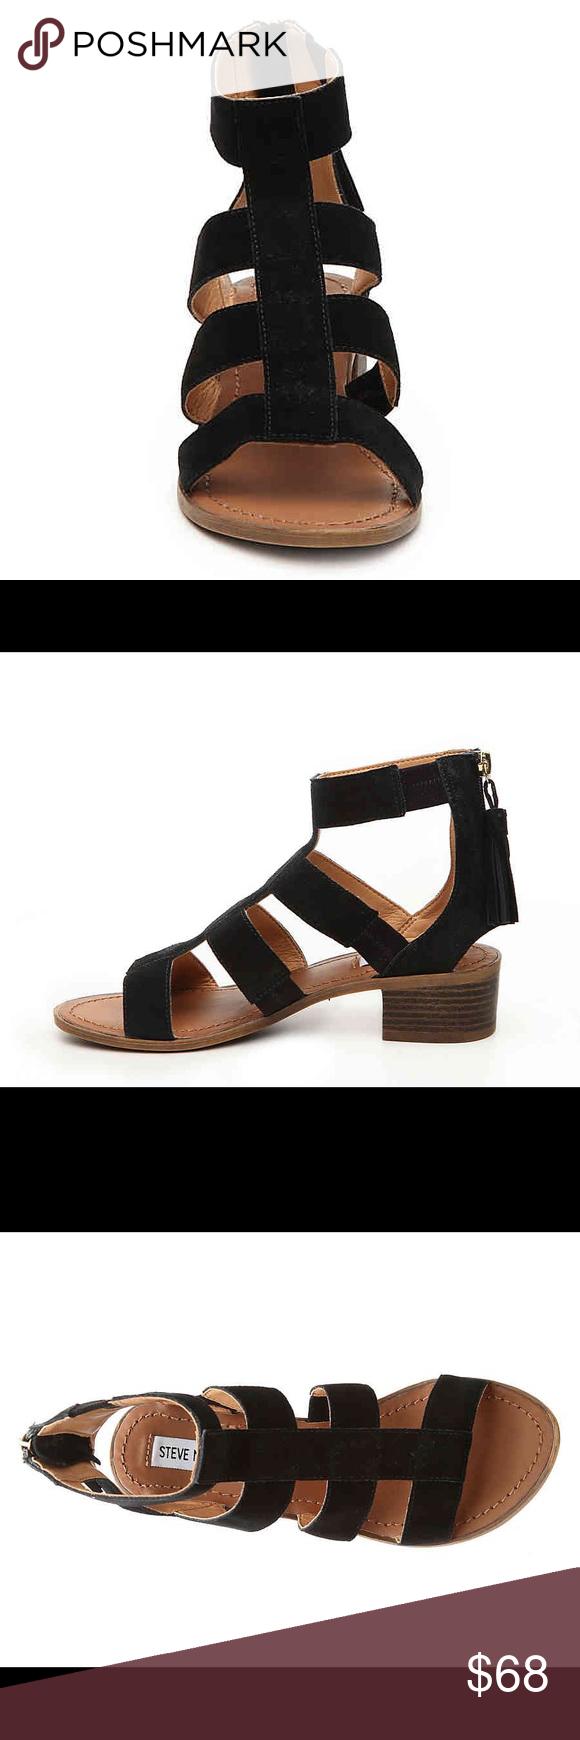 9a453f39cfc3 🌟NWT🌟 Steve Madden Daviss Black gladiator sandal NWT great shoe!  DESCRIPTION Item